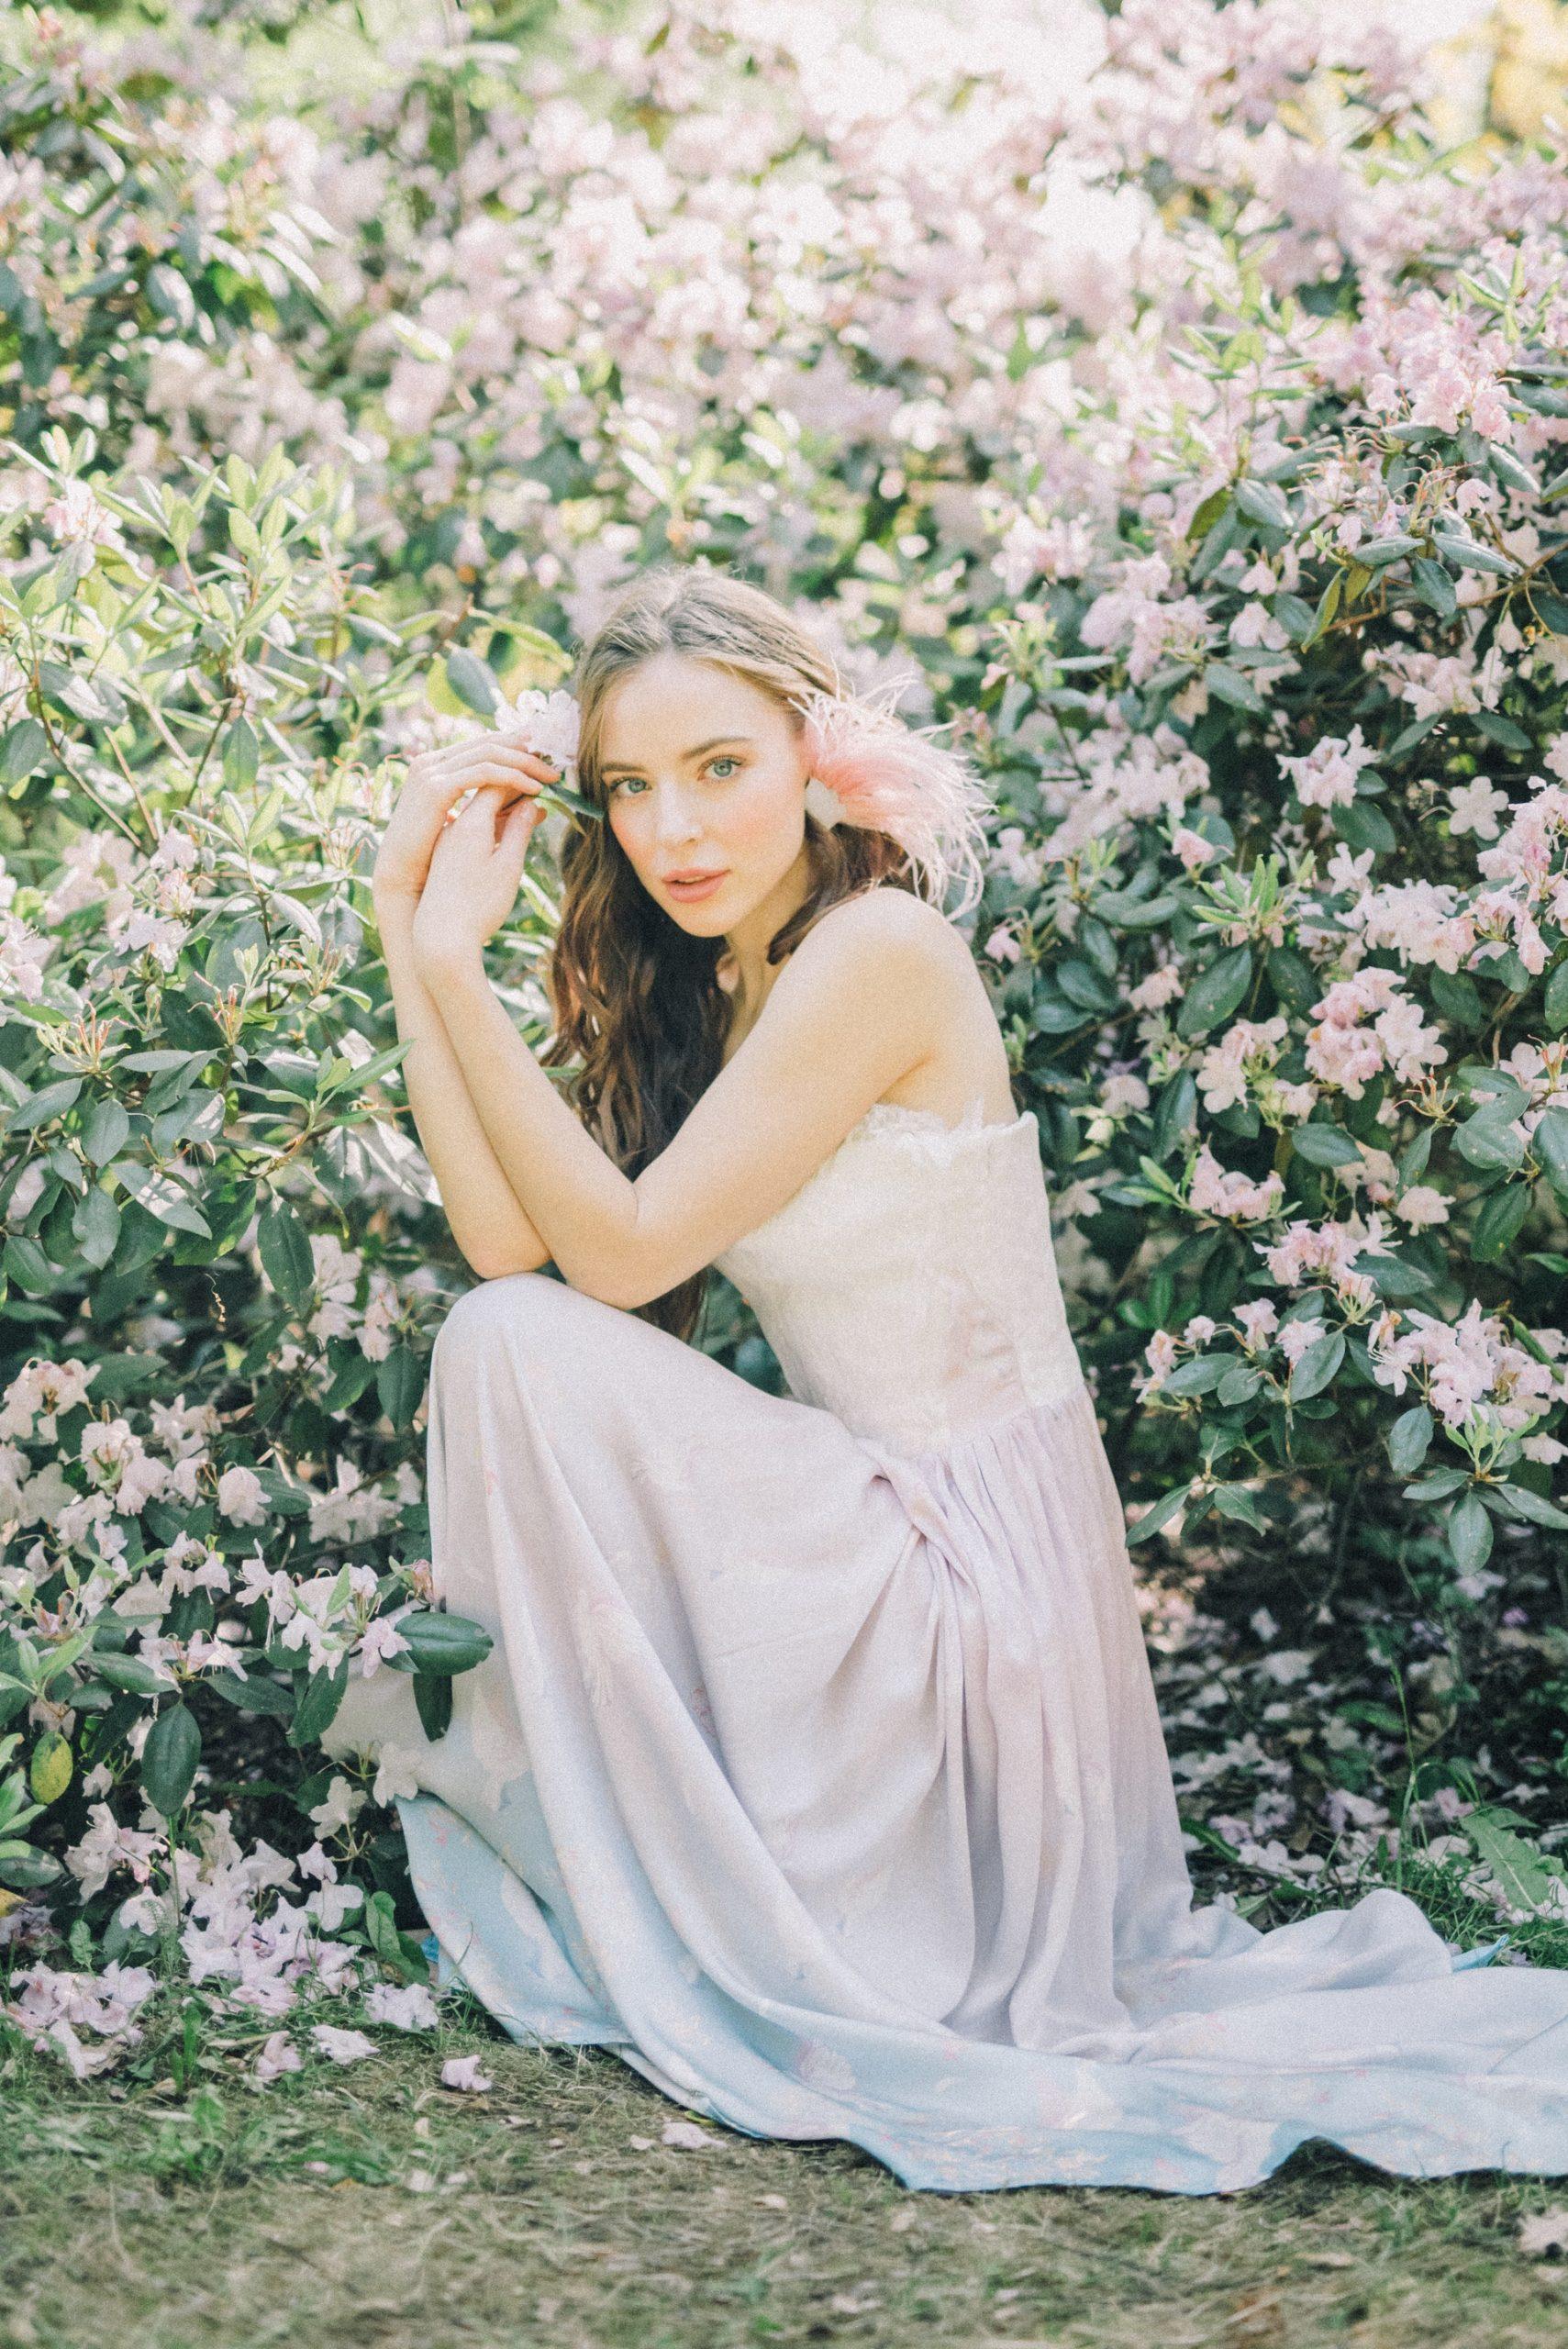 Earthly bride